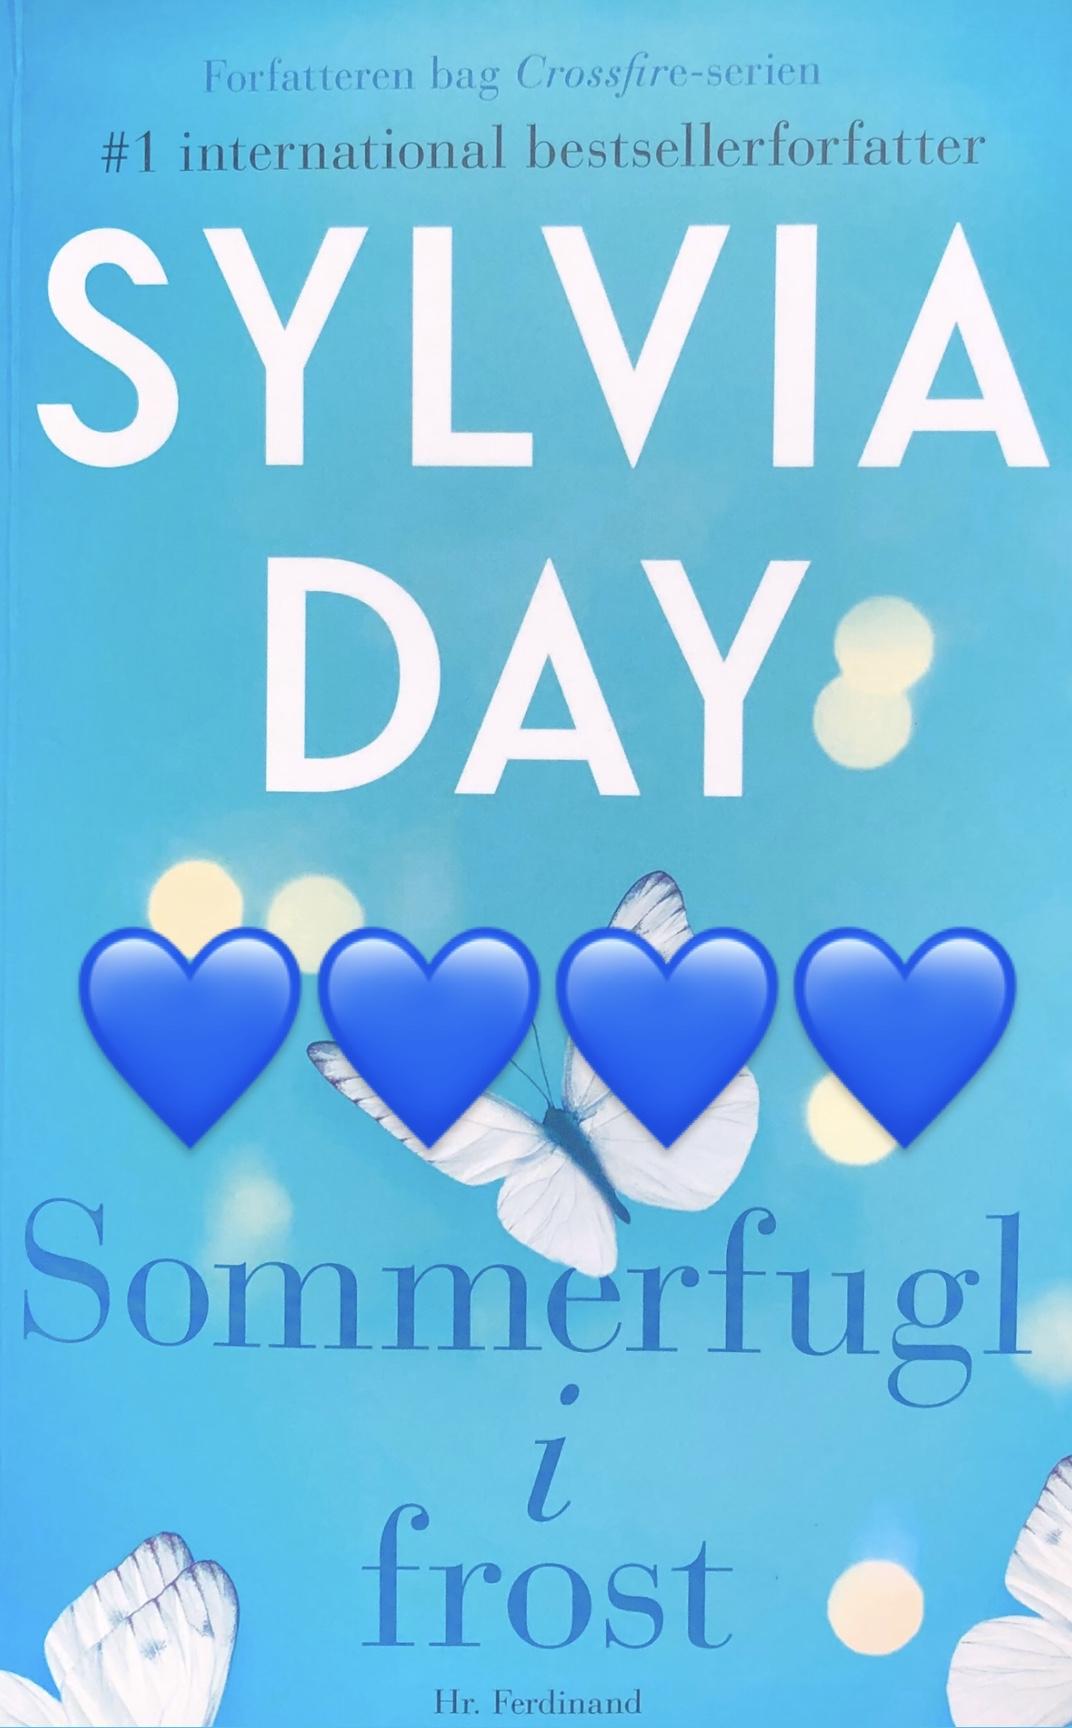 anmeldelse, boganmeldelse, anmeldelse af Sommerfugl i Frost, Sylvia Day, Hr. ferdinand, kærlighed, krummeskrummelurer, Krummes Krummelurer, krummeskrummelurer.dk, anmeldereksemplar,